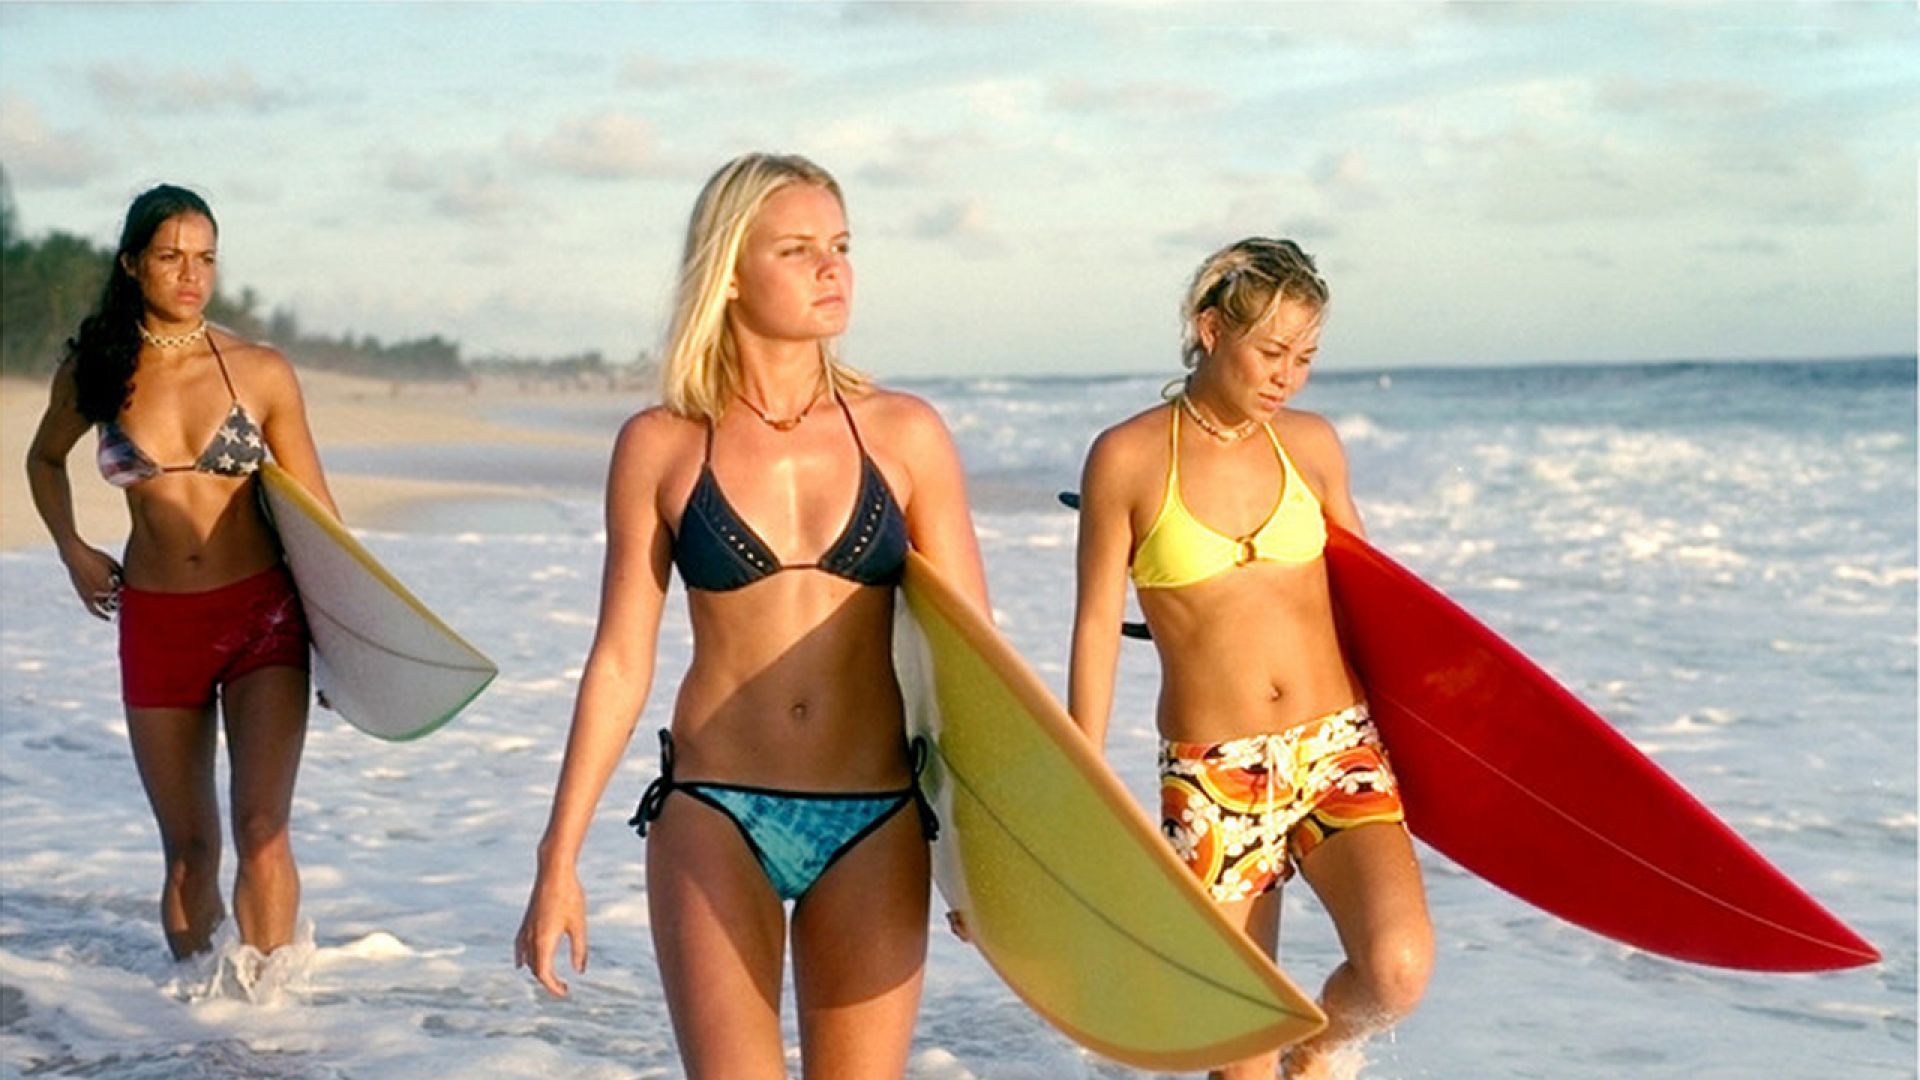 Sanoe lake bikini pic